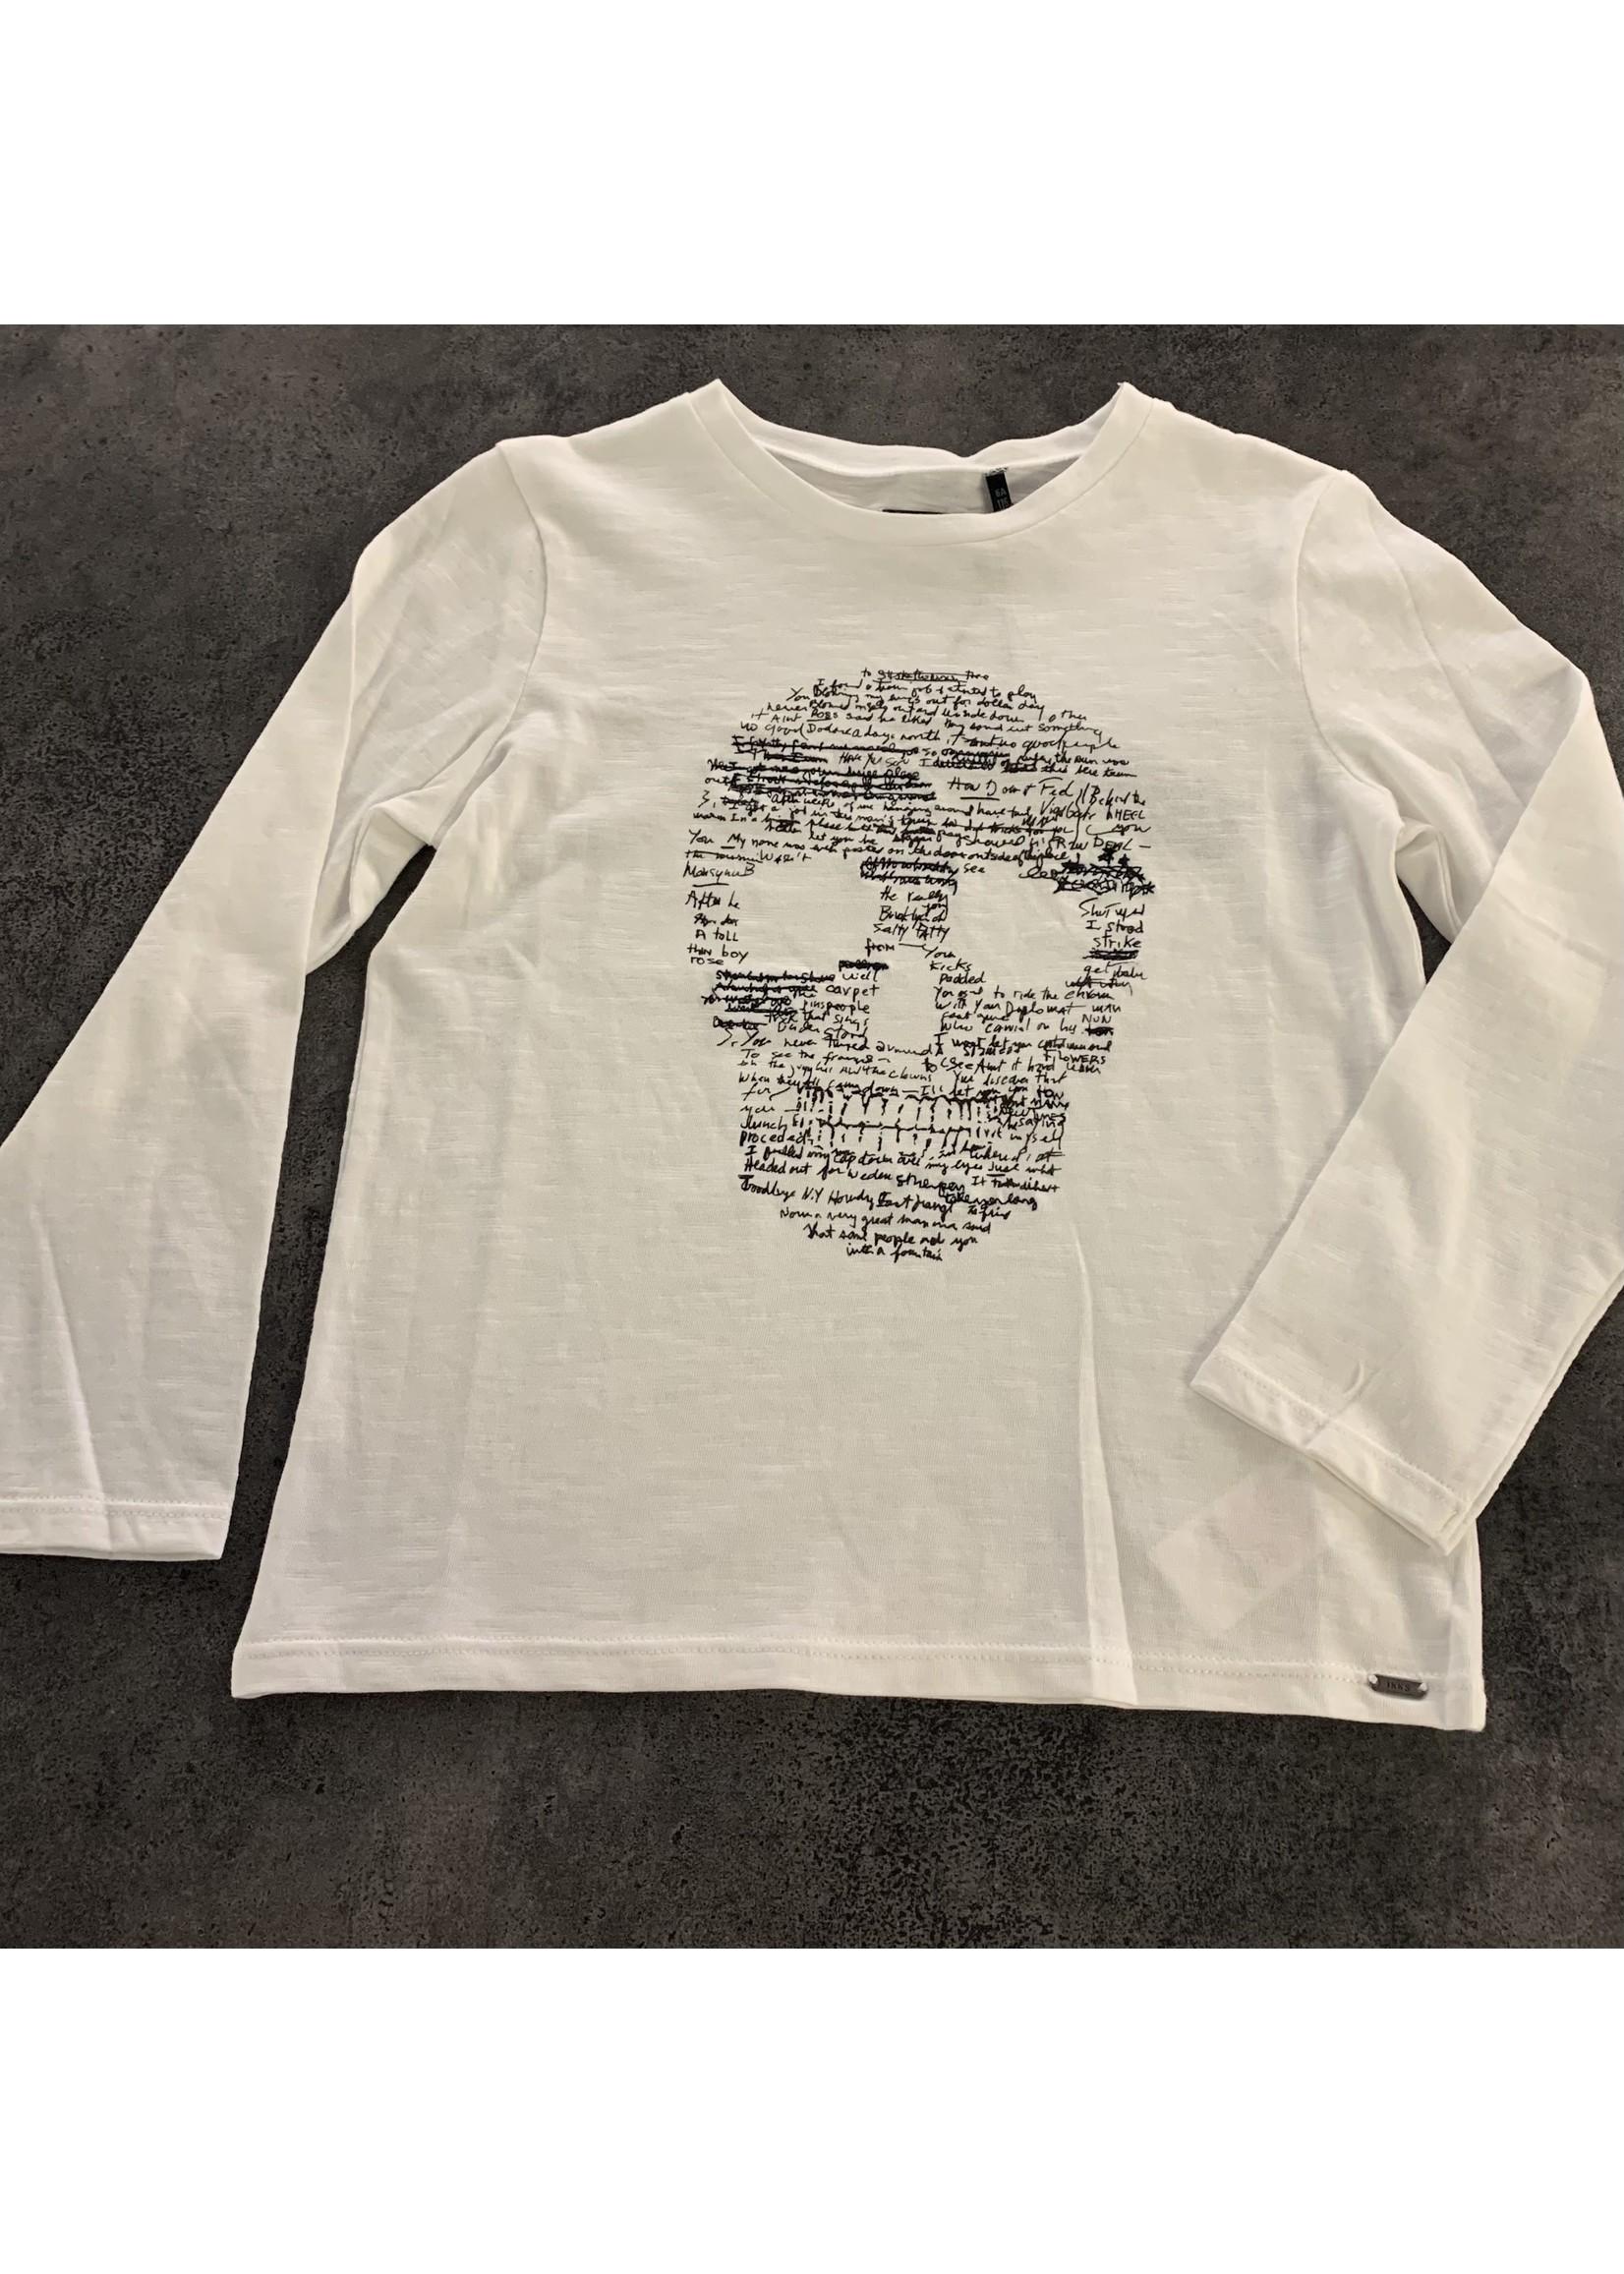 IKKS IKKS cozy rock tshirt